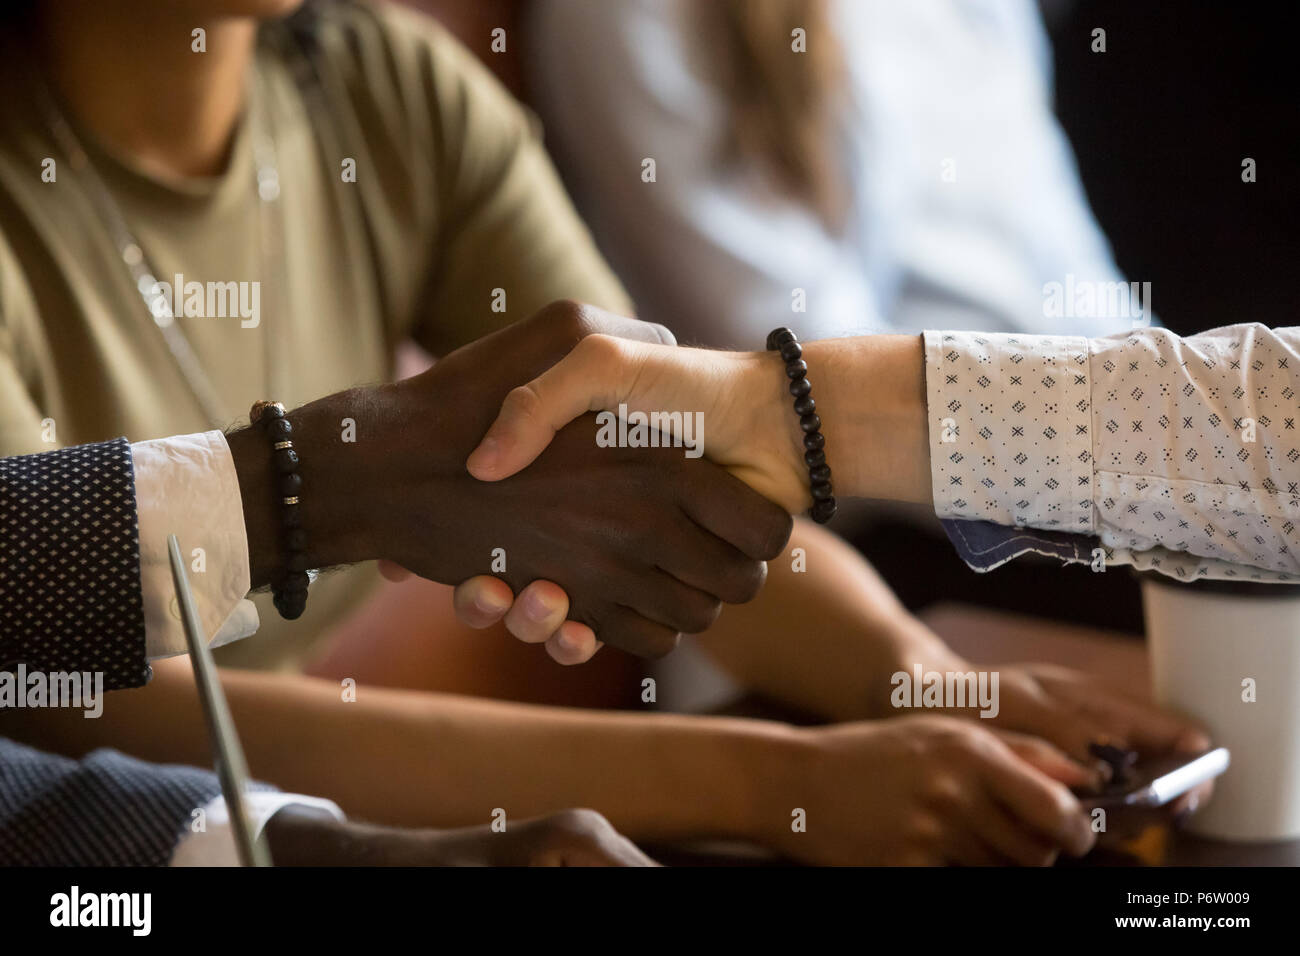 Multiracial handshake greeting during business meeting in cafe - Stock Image